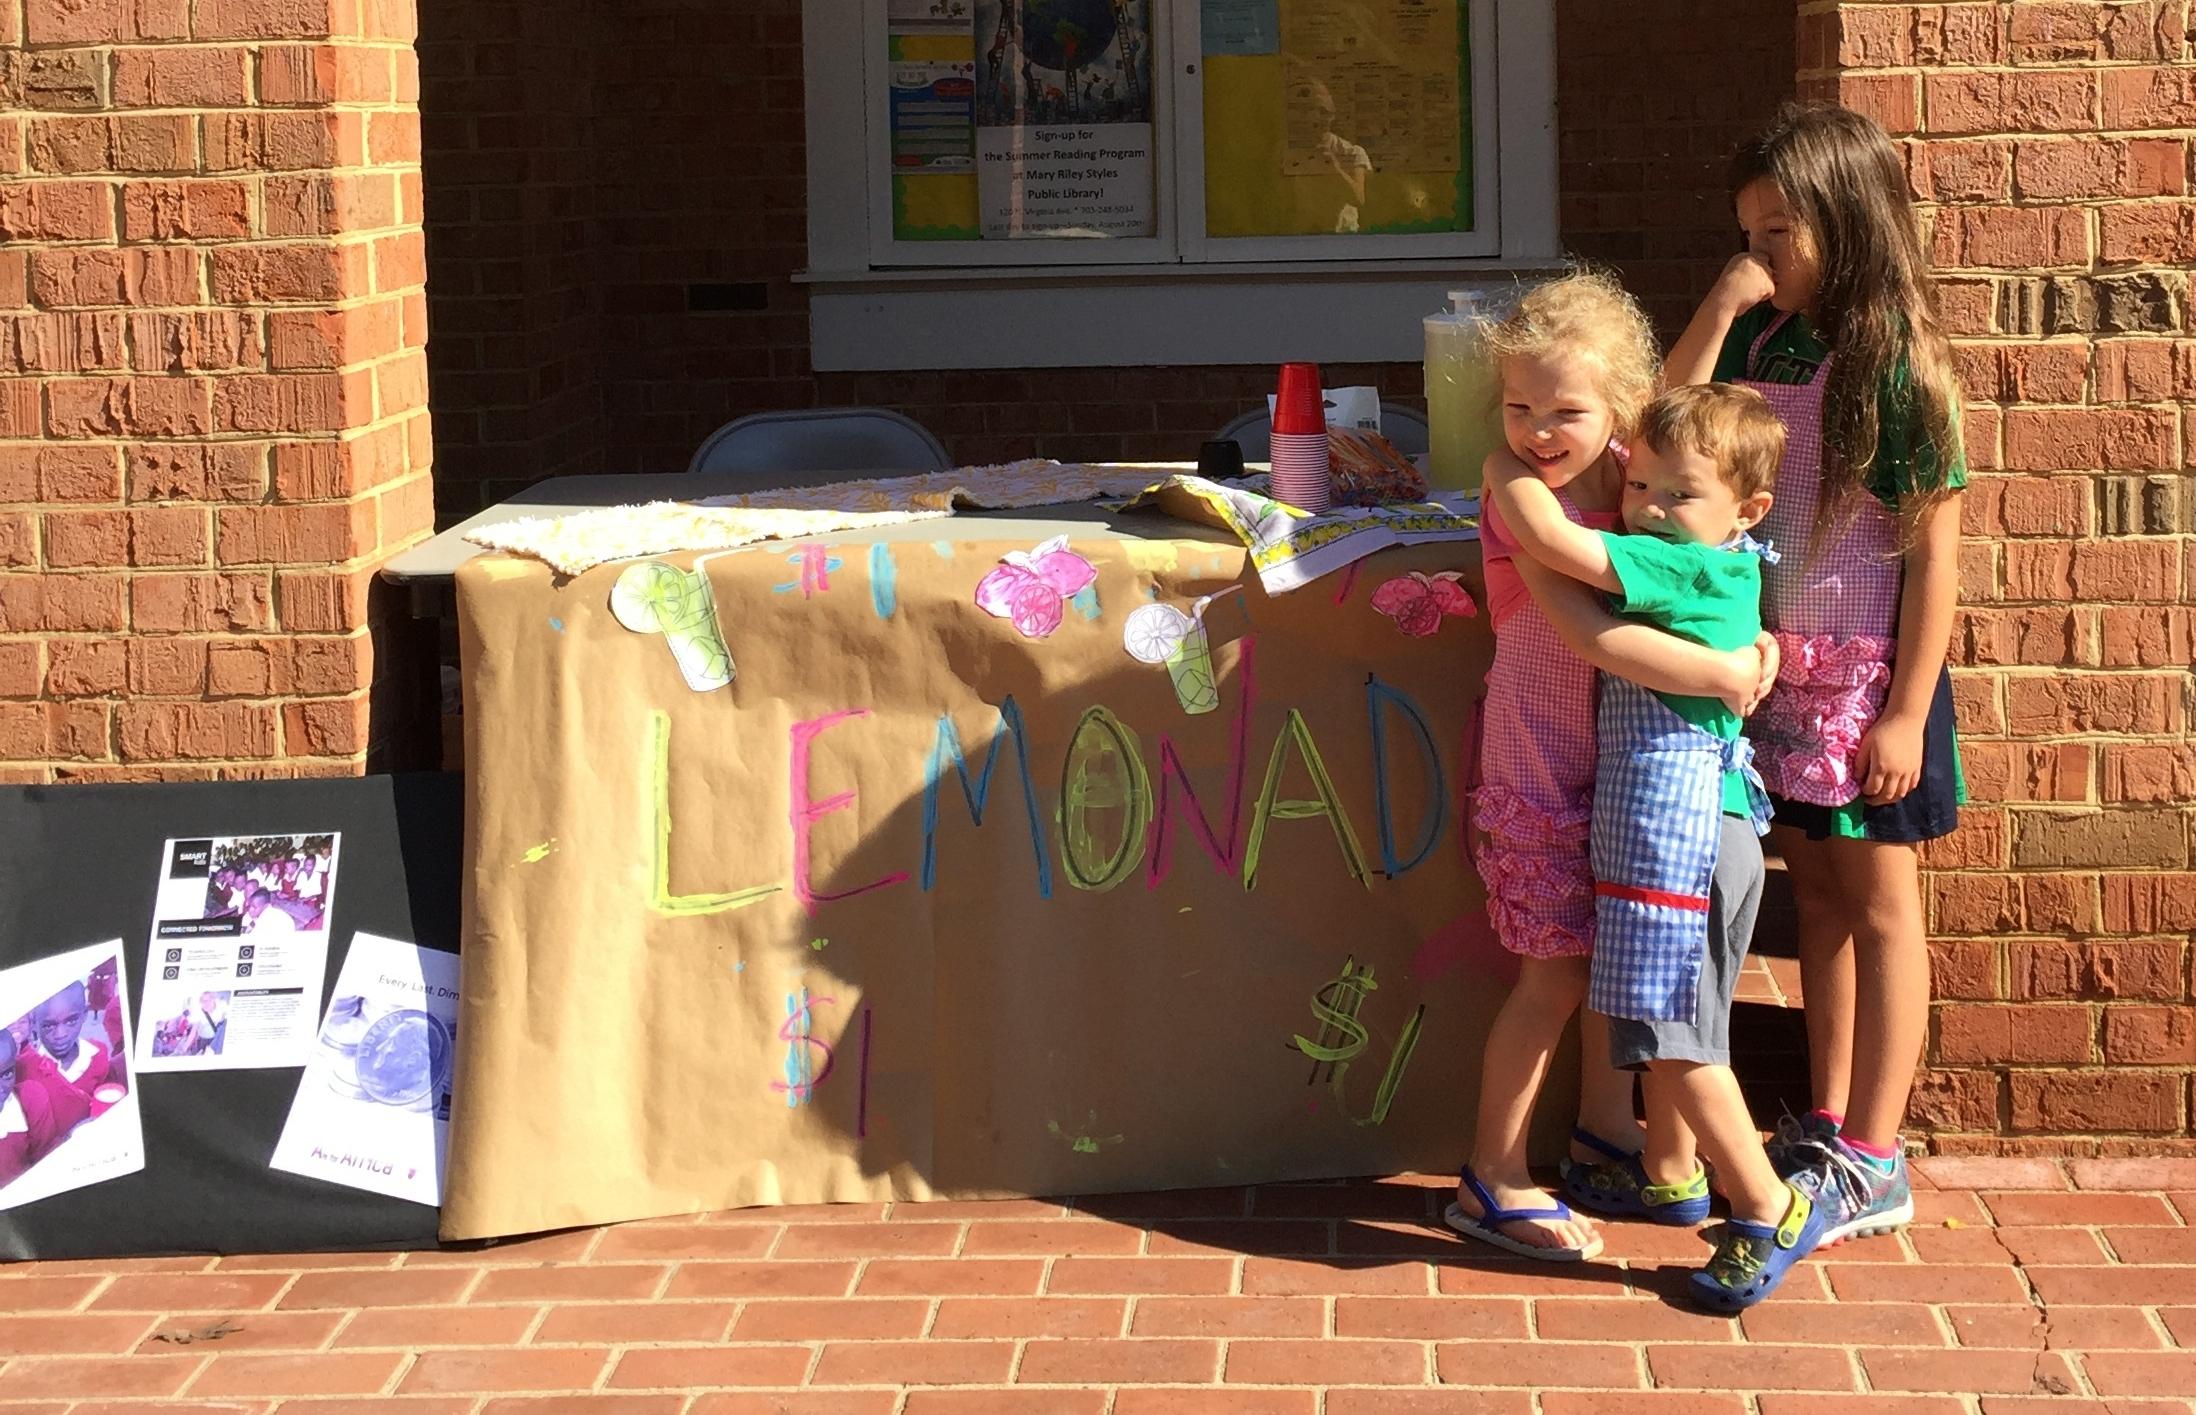 kids setting up lemonade stand, robin camarote